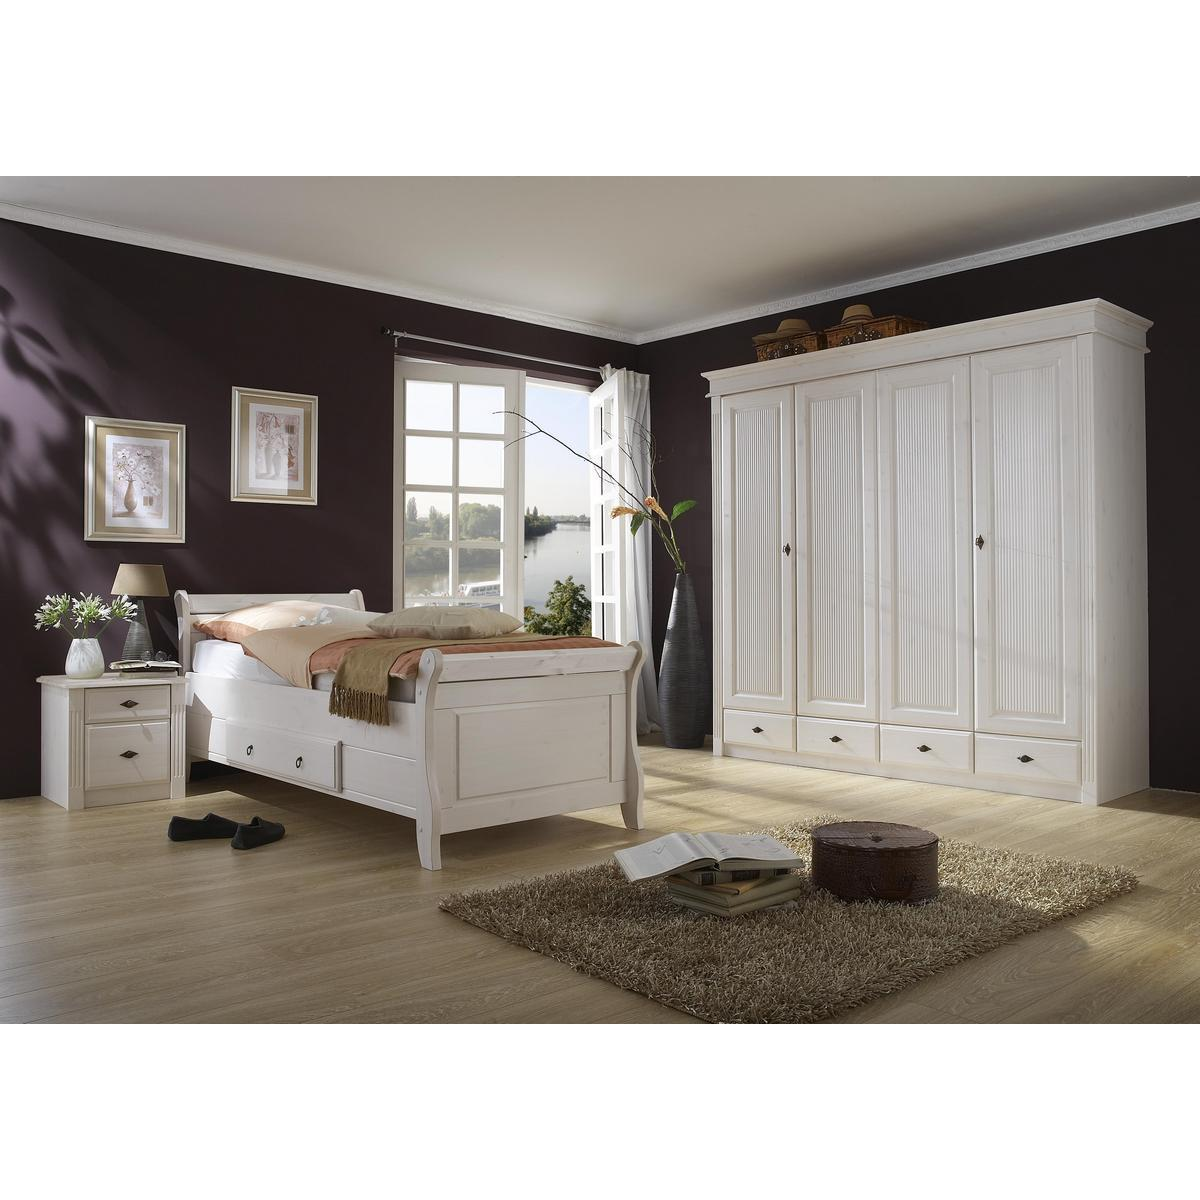 Schlafzimmer Komplett Massivholz : Schlafzimmer Komplett Massivholz Weiß  Massivholz Schlafzimmer